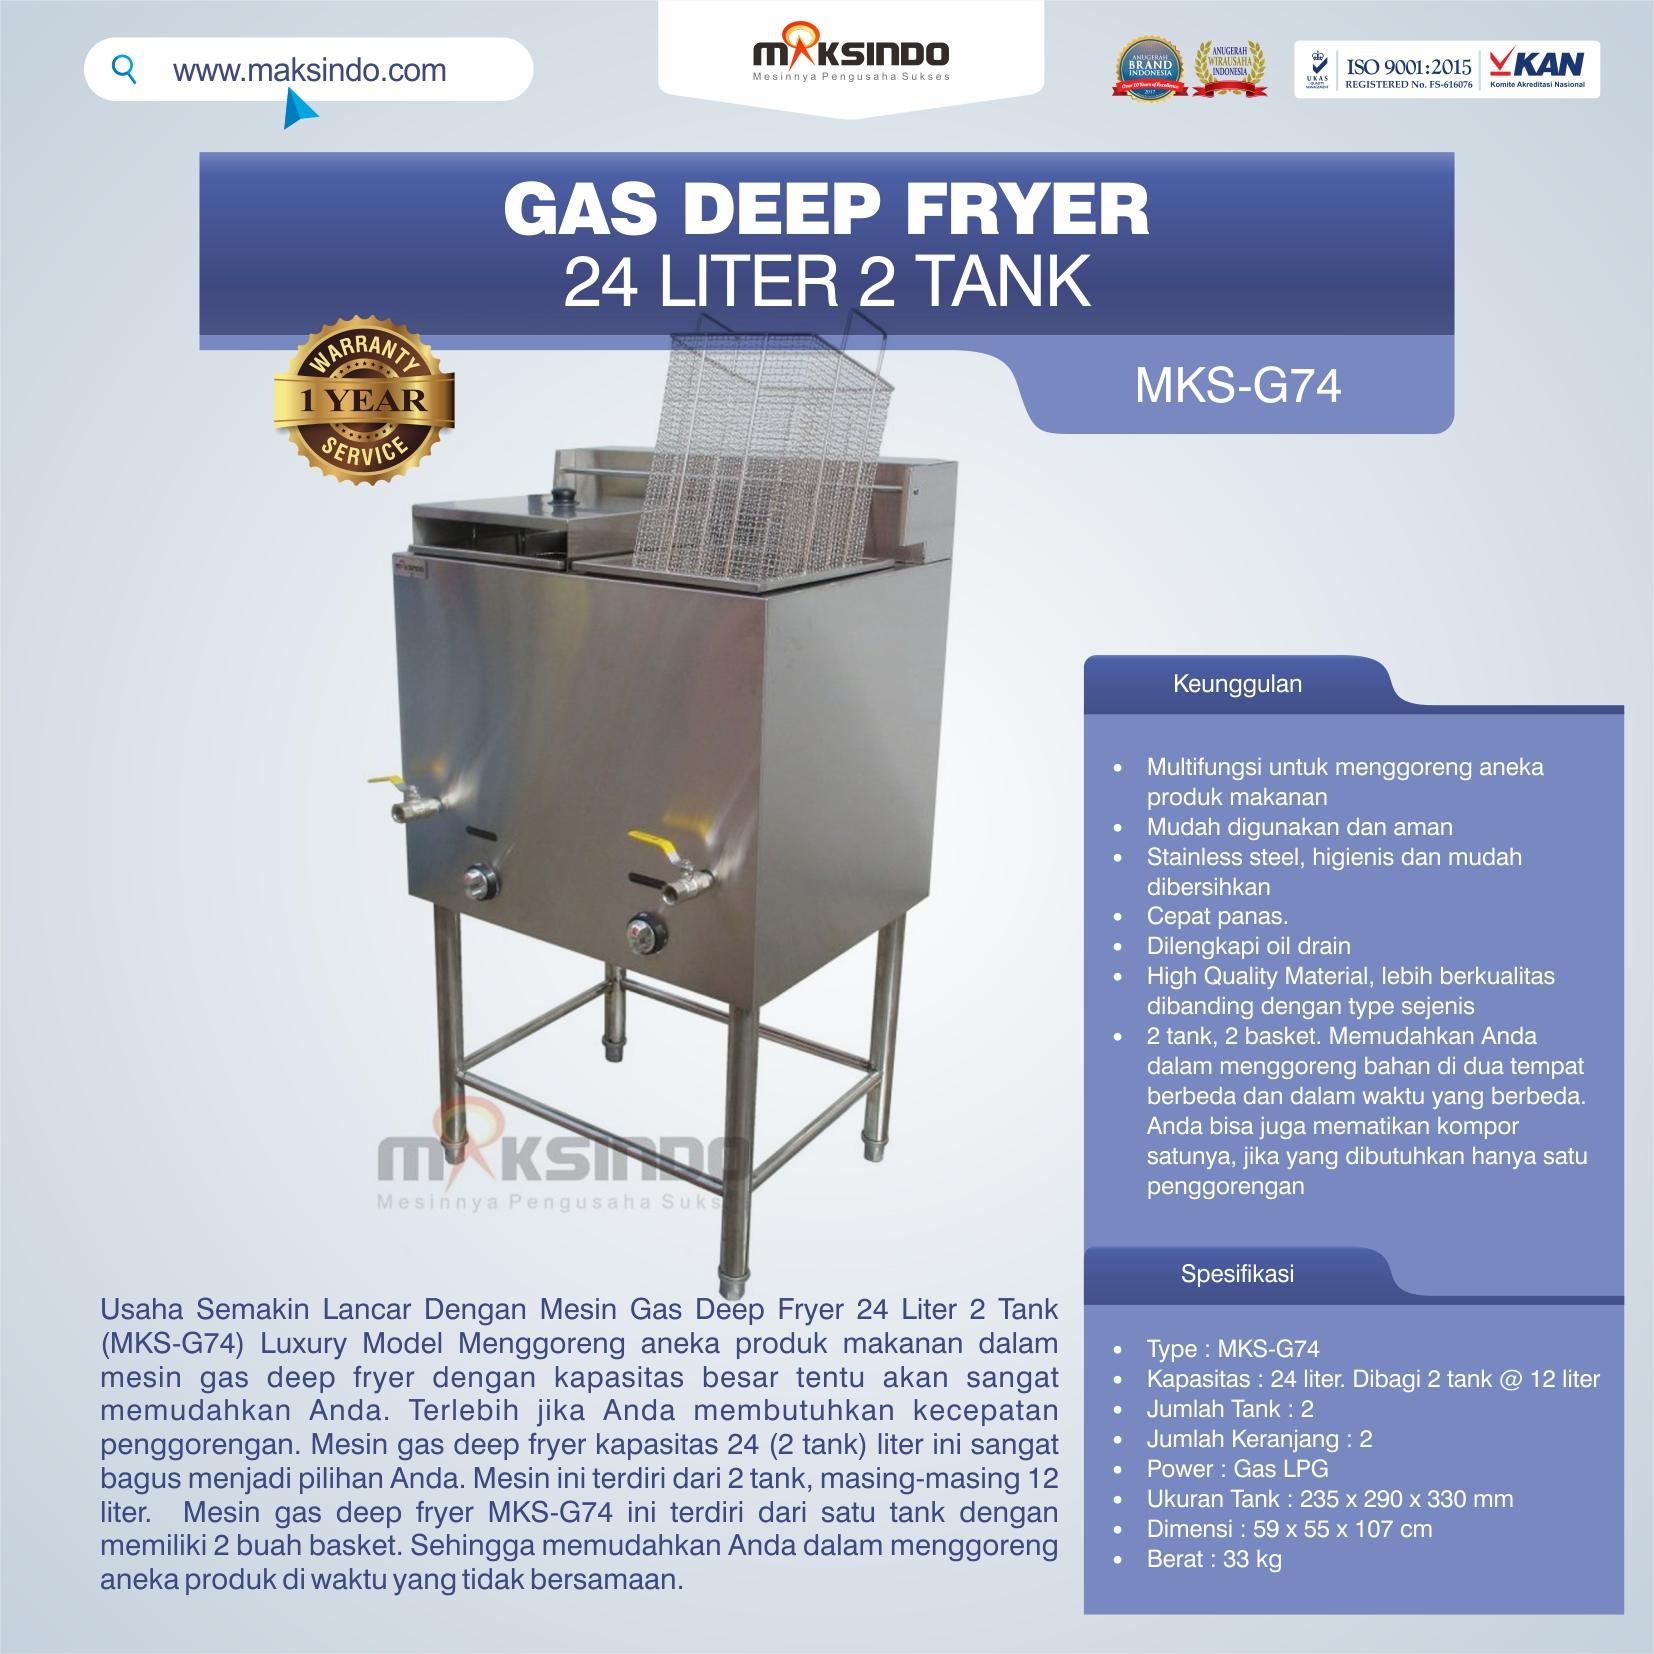 Jual Gas Deep Fryer 24 Liter 2 Tank (G74) di Solo